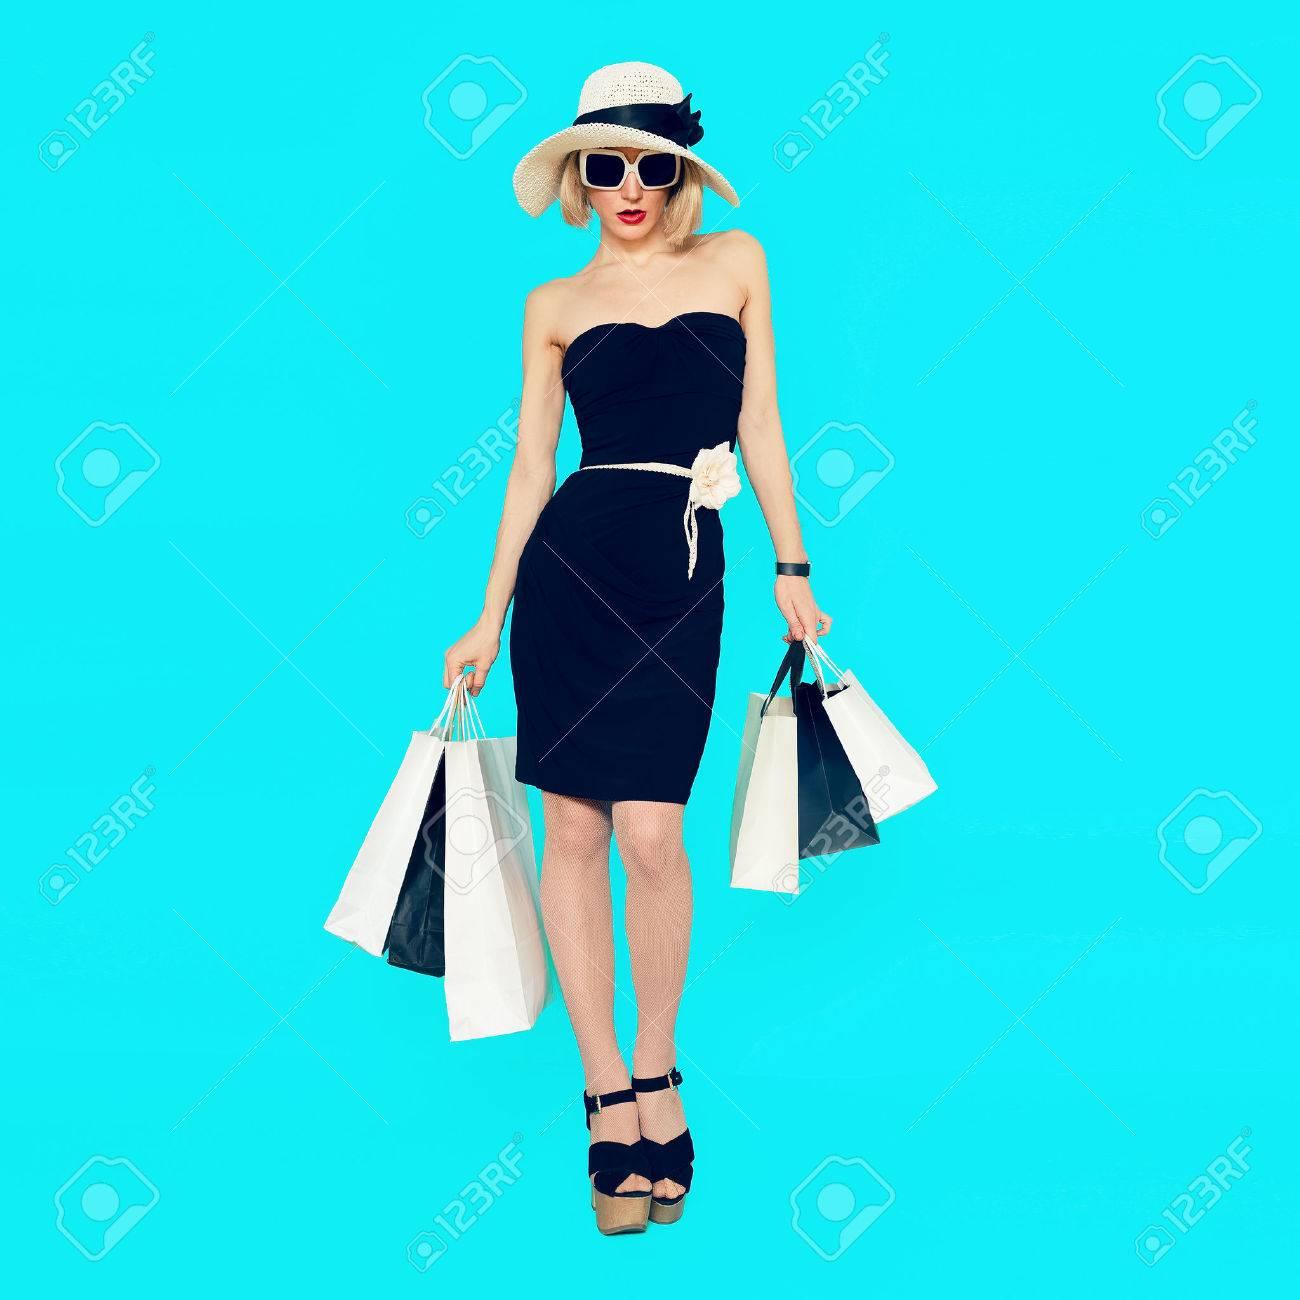 Stylish shopping lady with shopping bags on blue background - 44776668